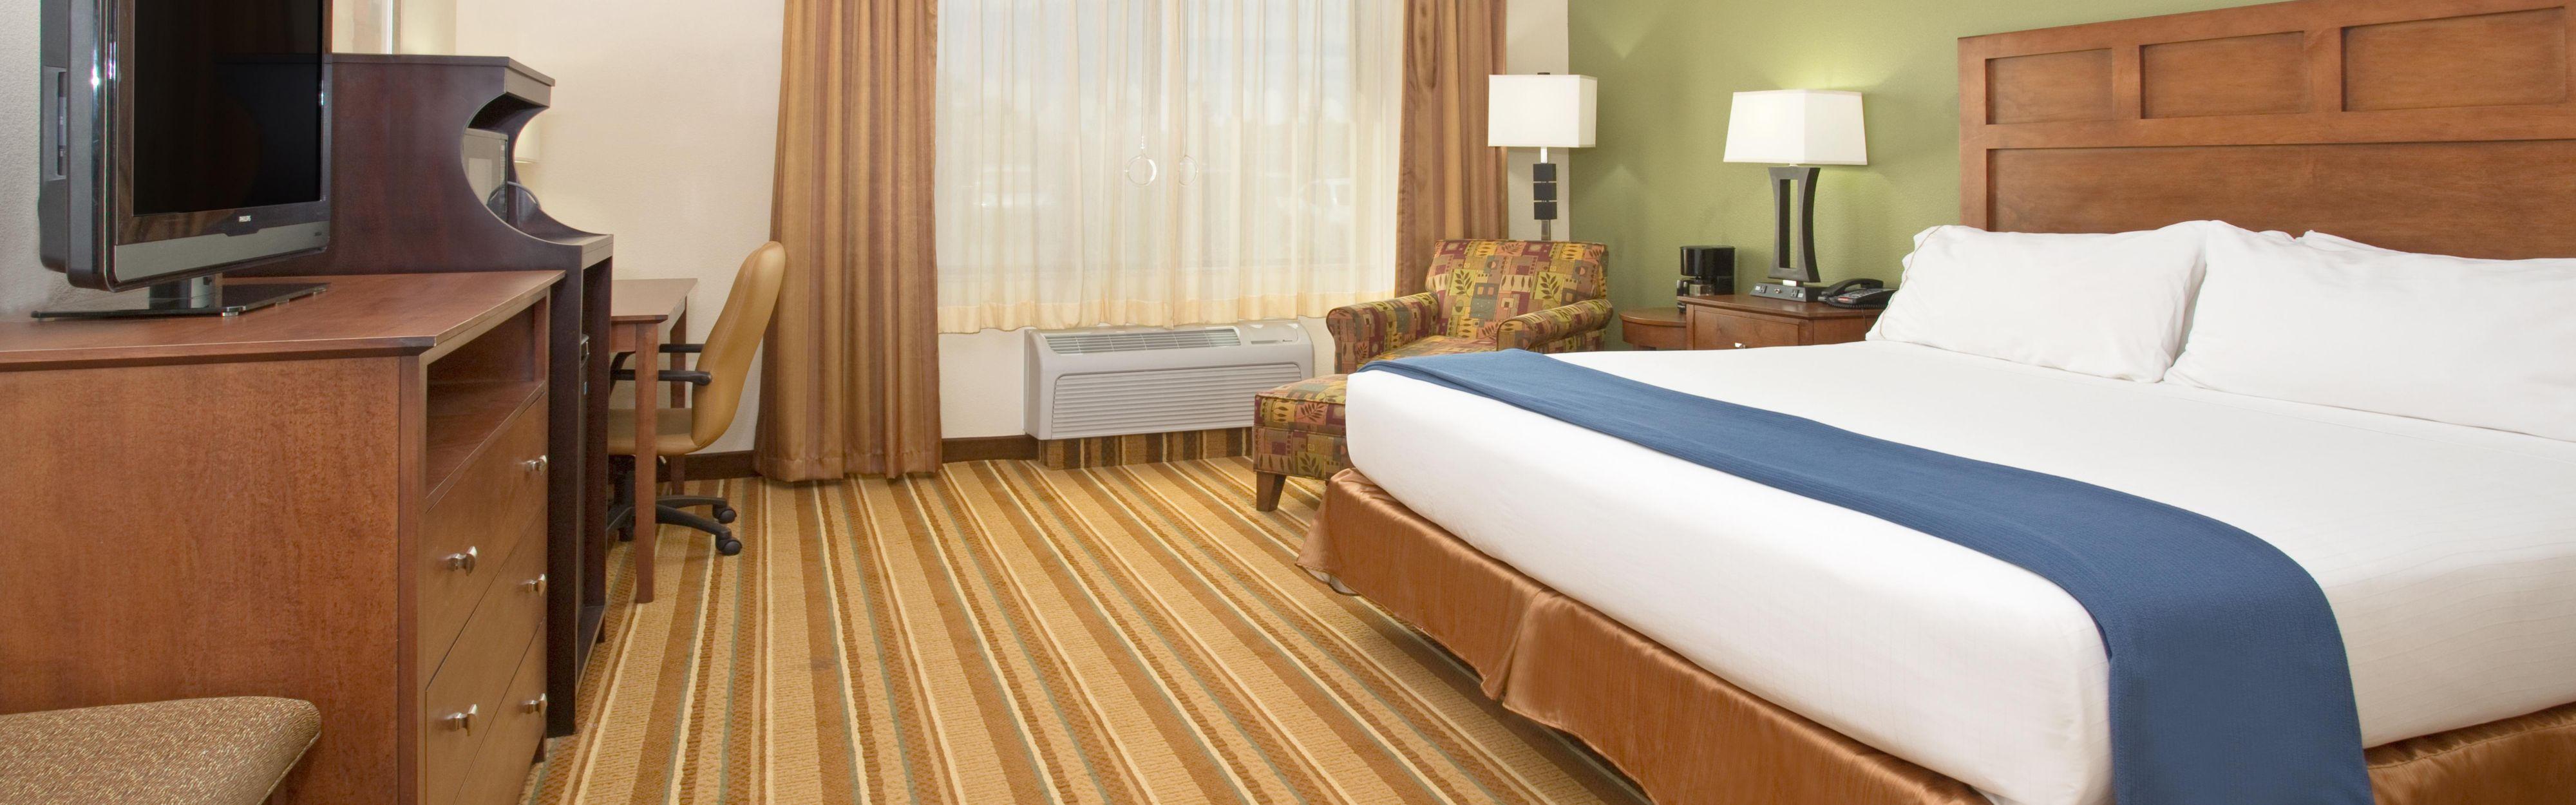 Holiday Inn Express & Suites Los Alamos Entrada Park image 1